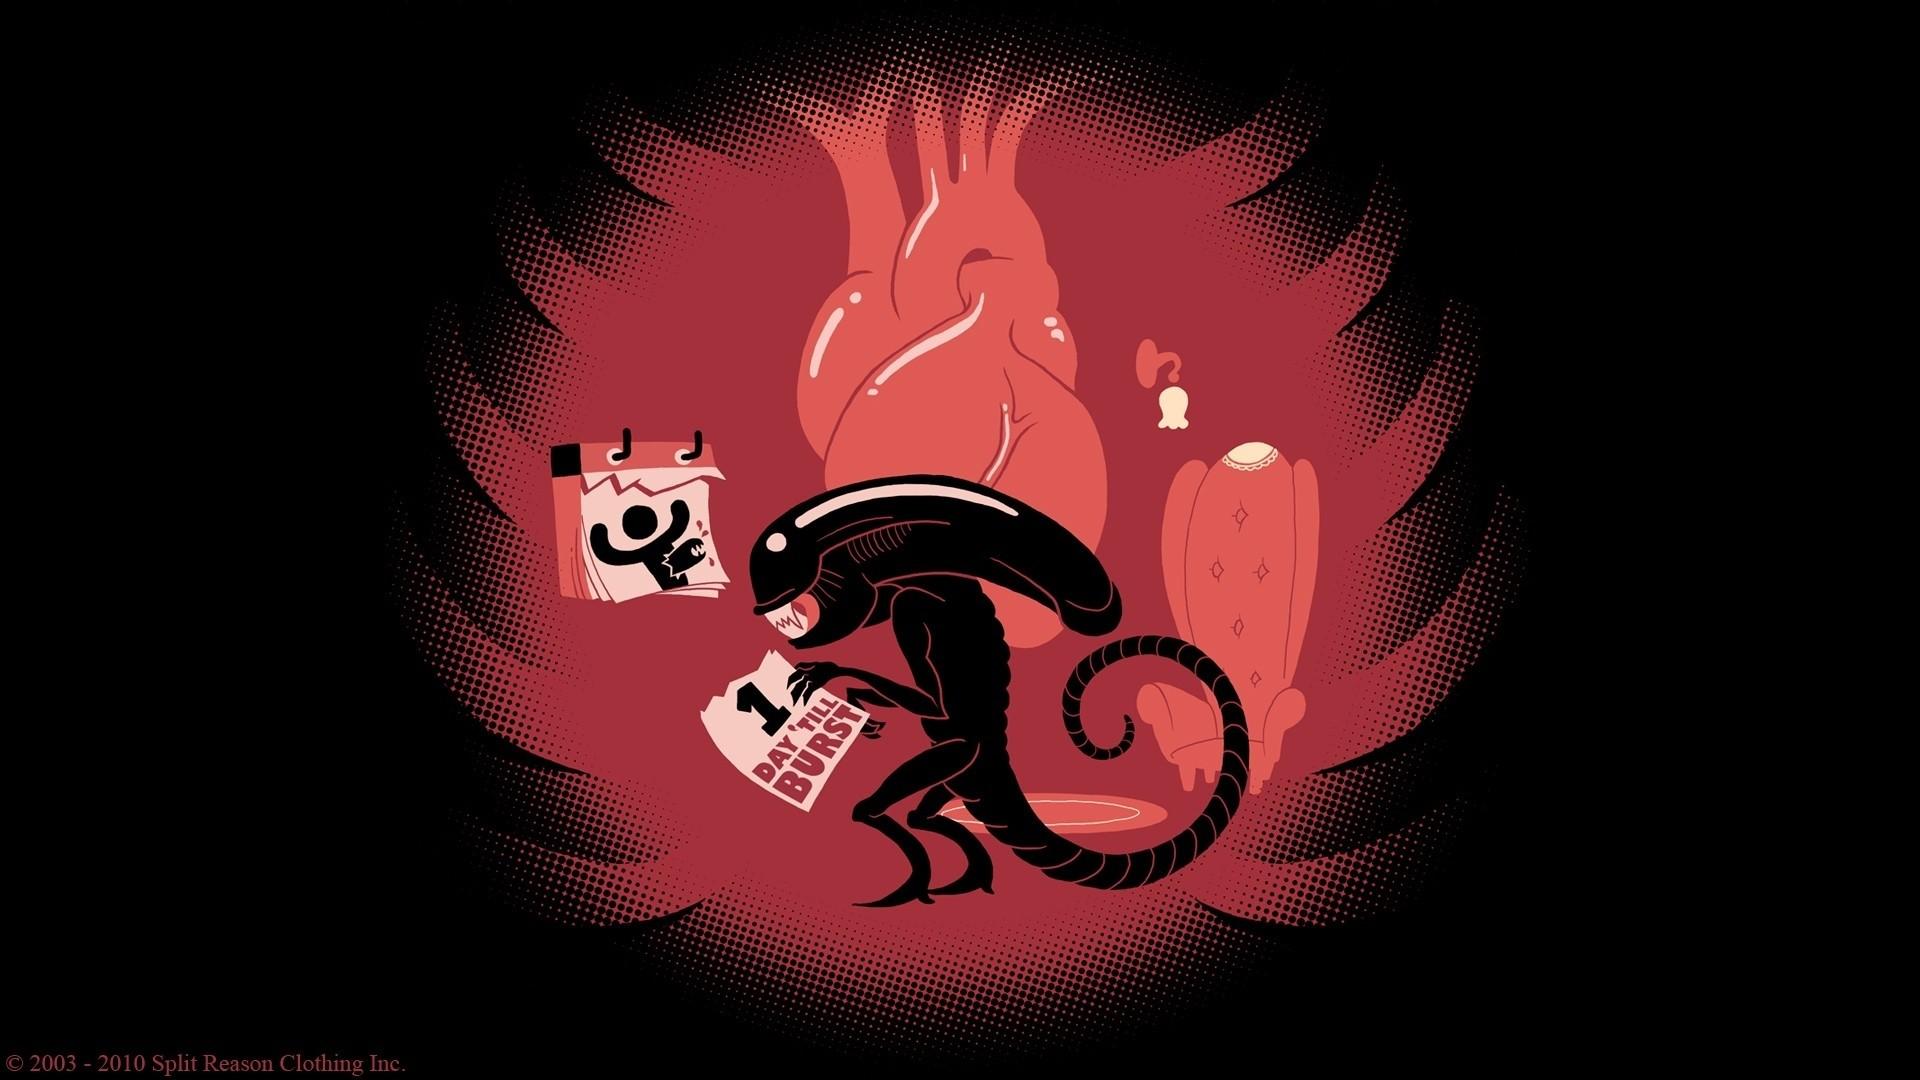 illustration humor red logo Xenomorph aliens poster happy birthday darkness computer wallpaper font organ album cover